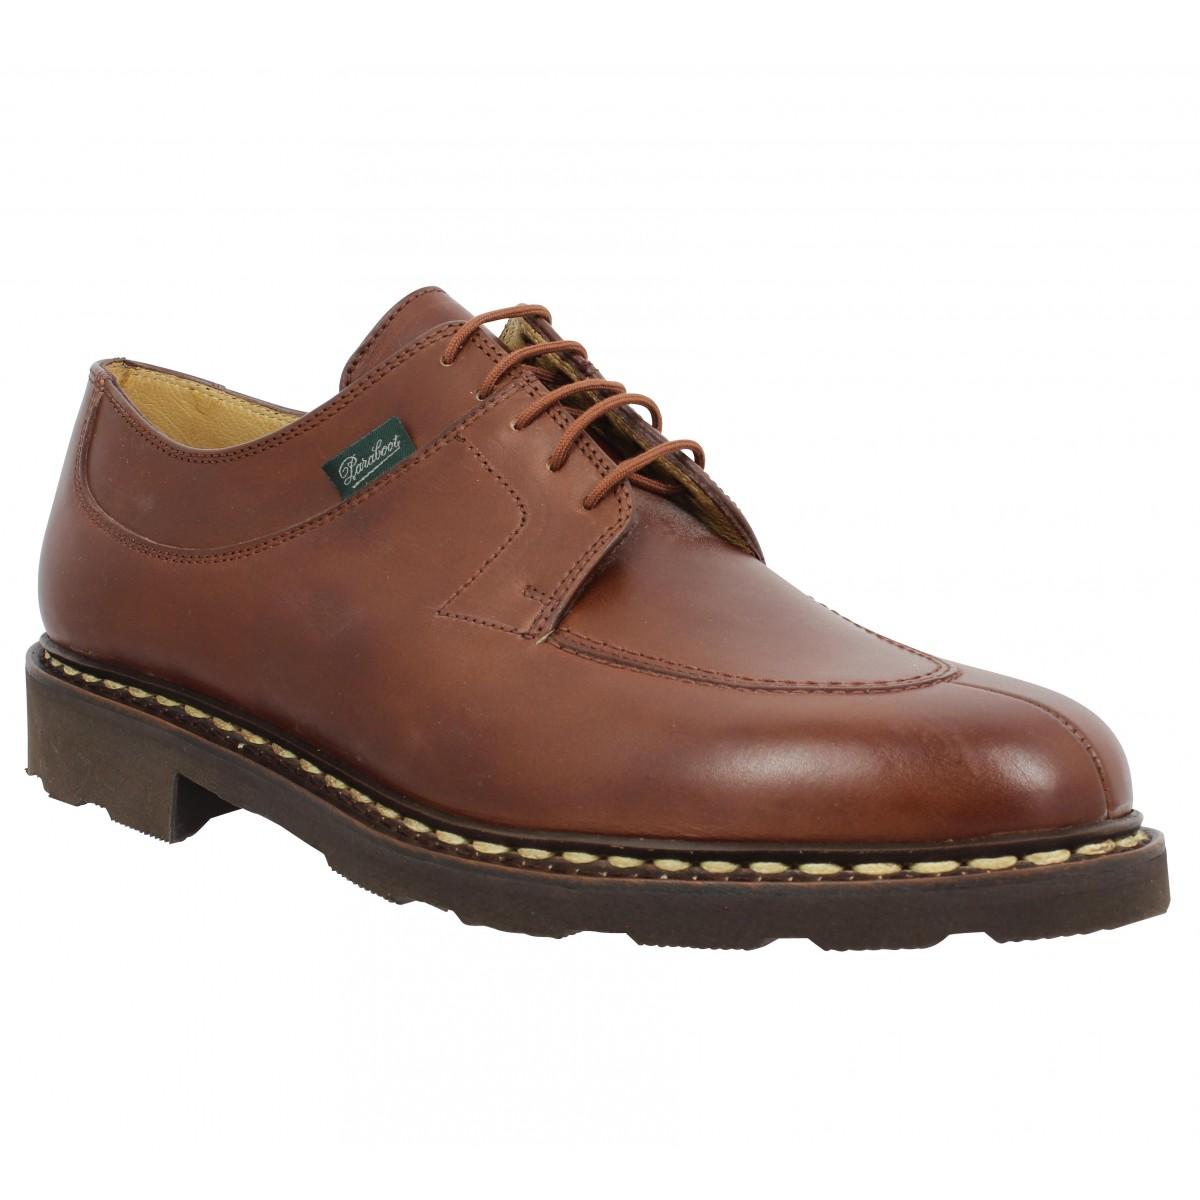 193387ab31ca2c Paraboot avignon cuir homme marron homme | Fanny chaussures